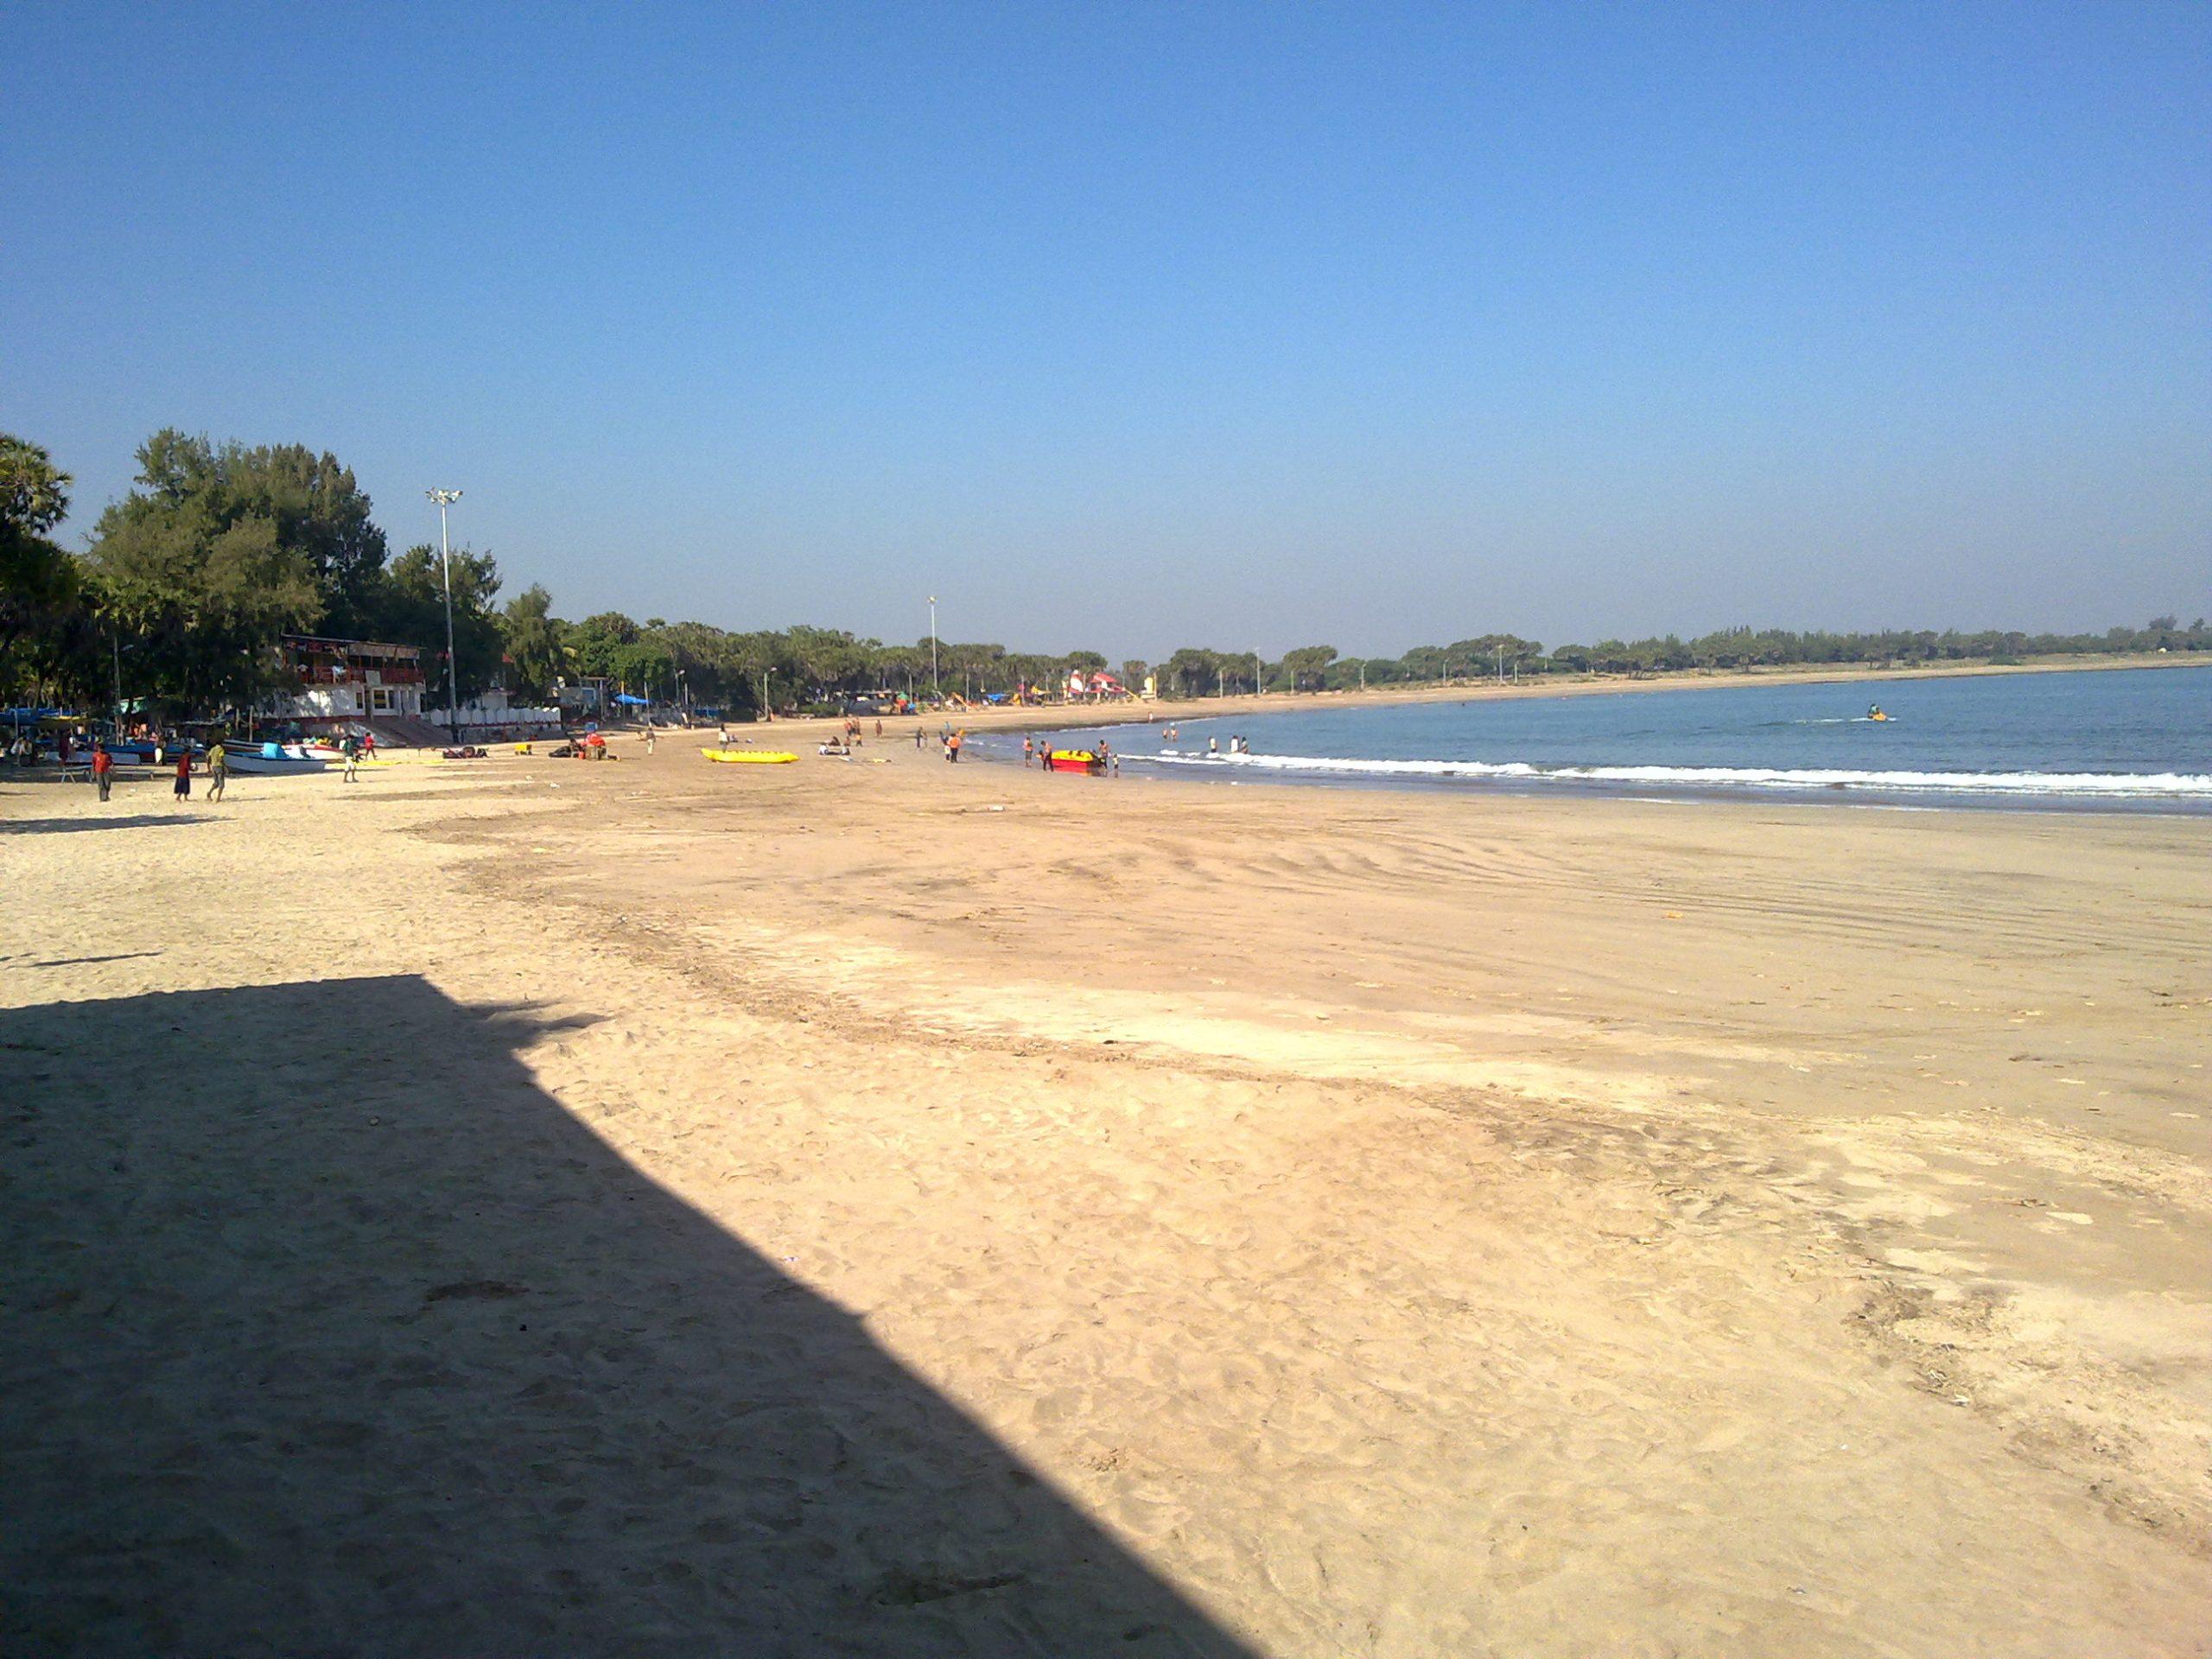 The Diu Fort Amazing Weekend Getaway Near Ahmedabad